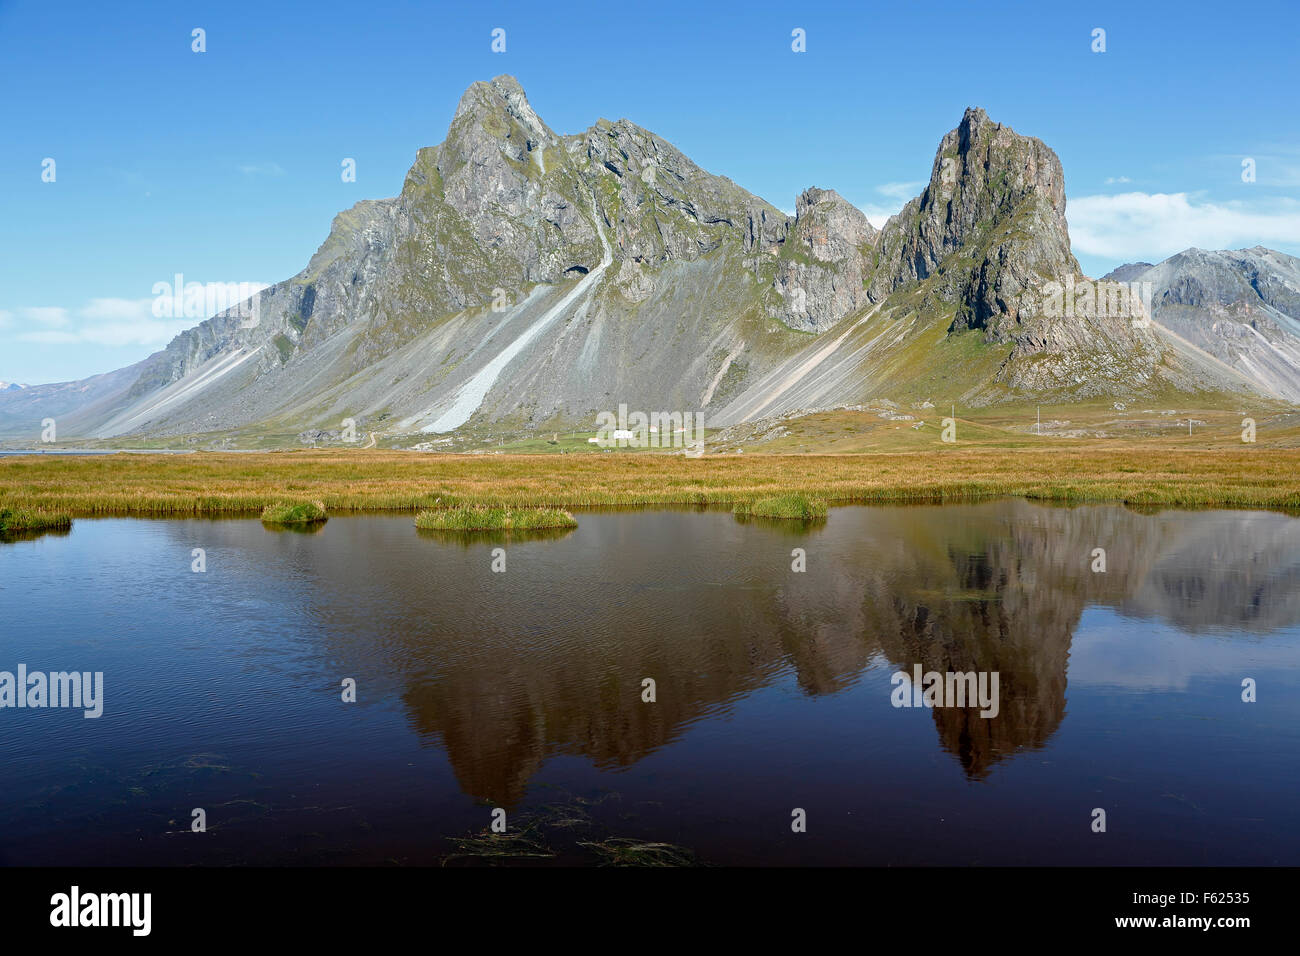 Montaña Vikurfjall reflejada en el estanque, cerca de la Reserva Natural Hvalnes, Islandia Foto de stock